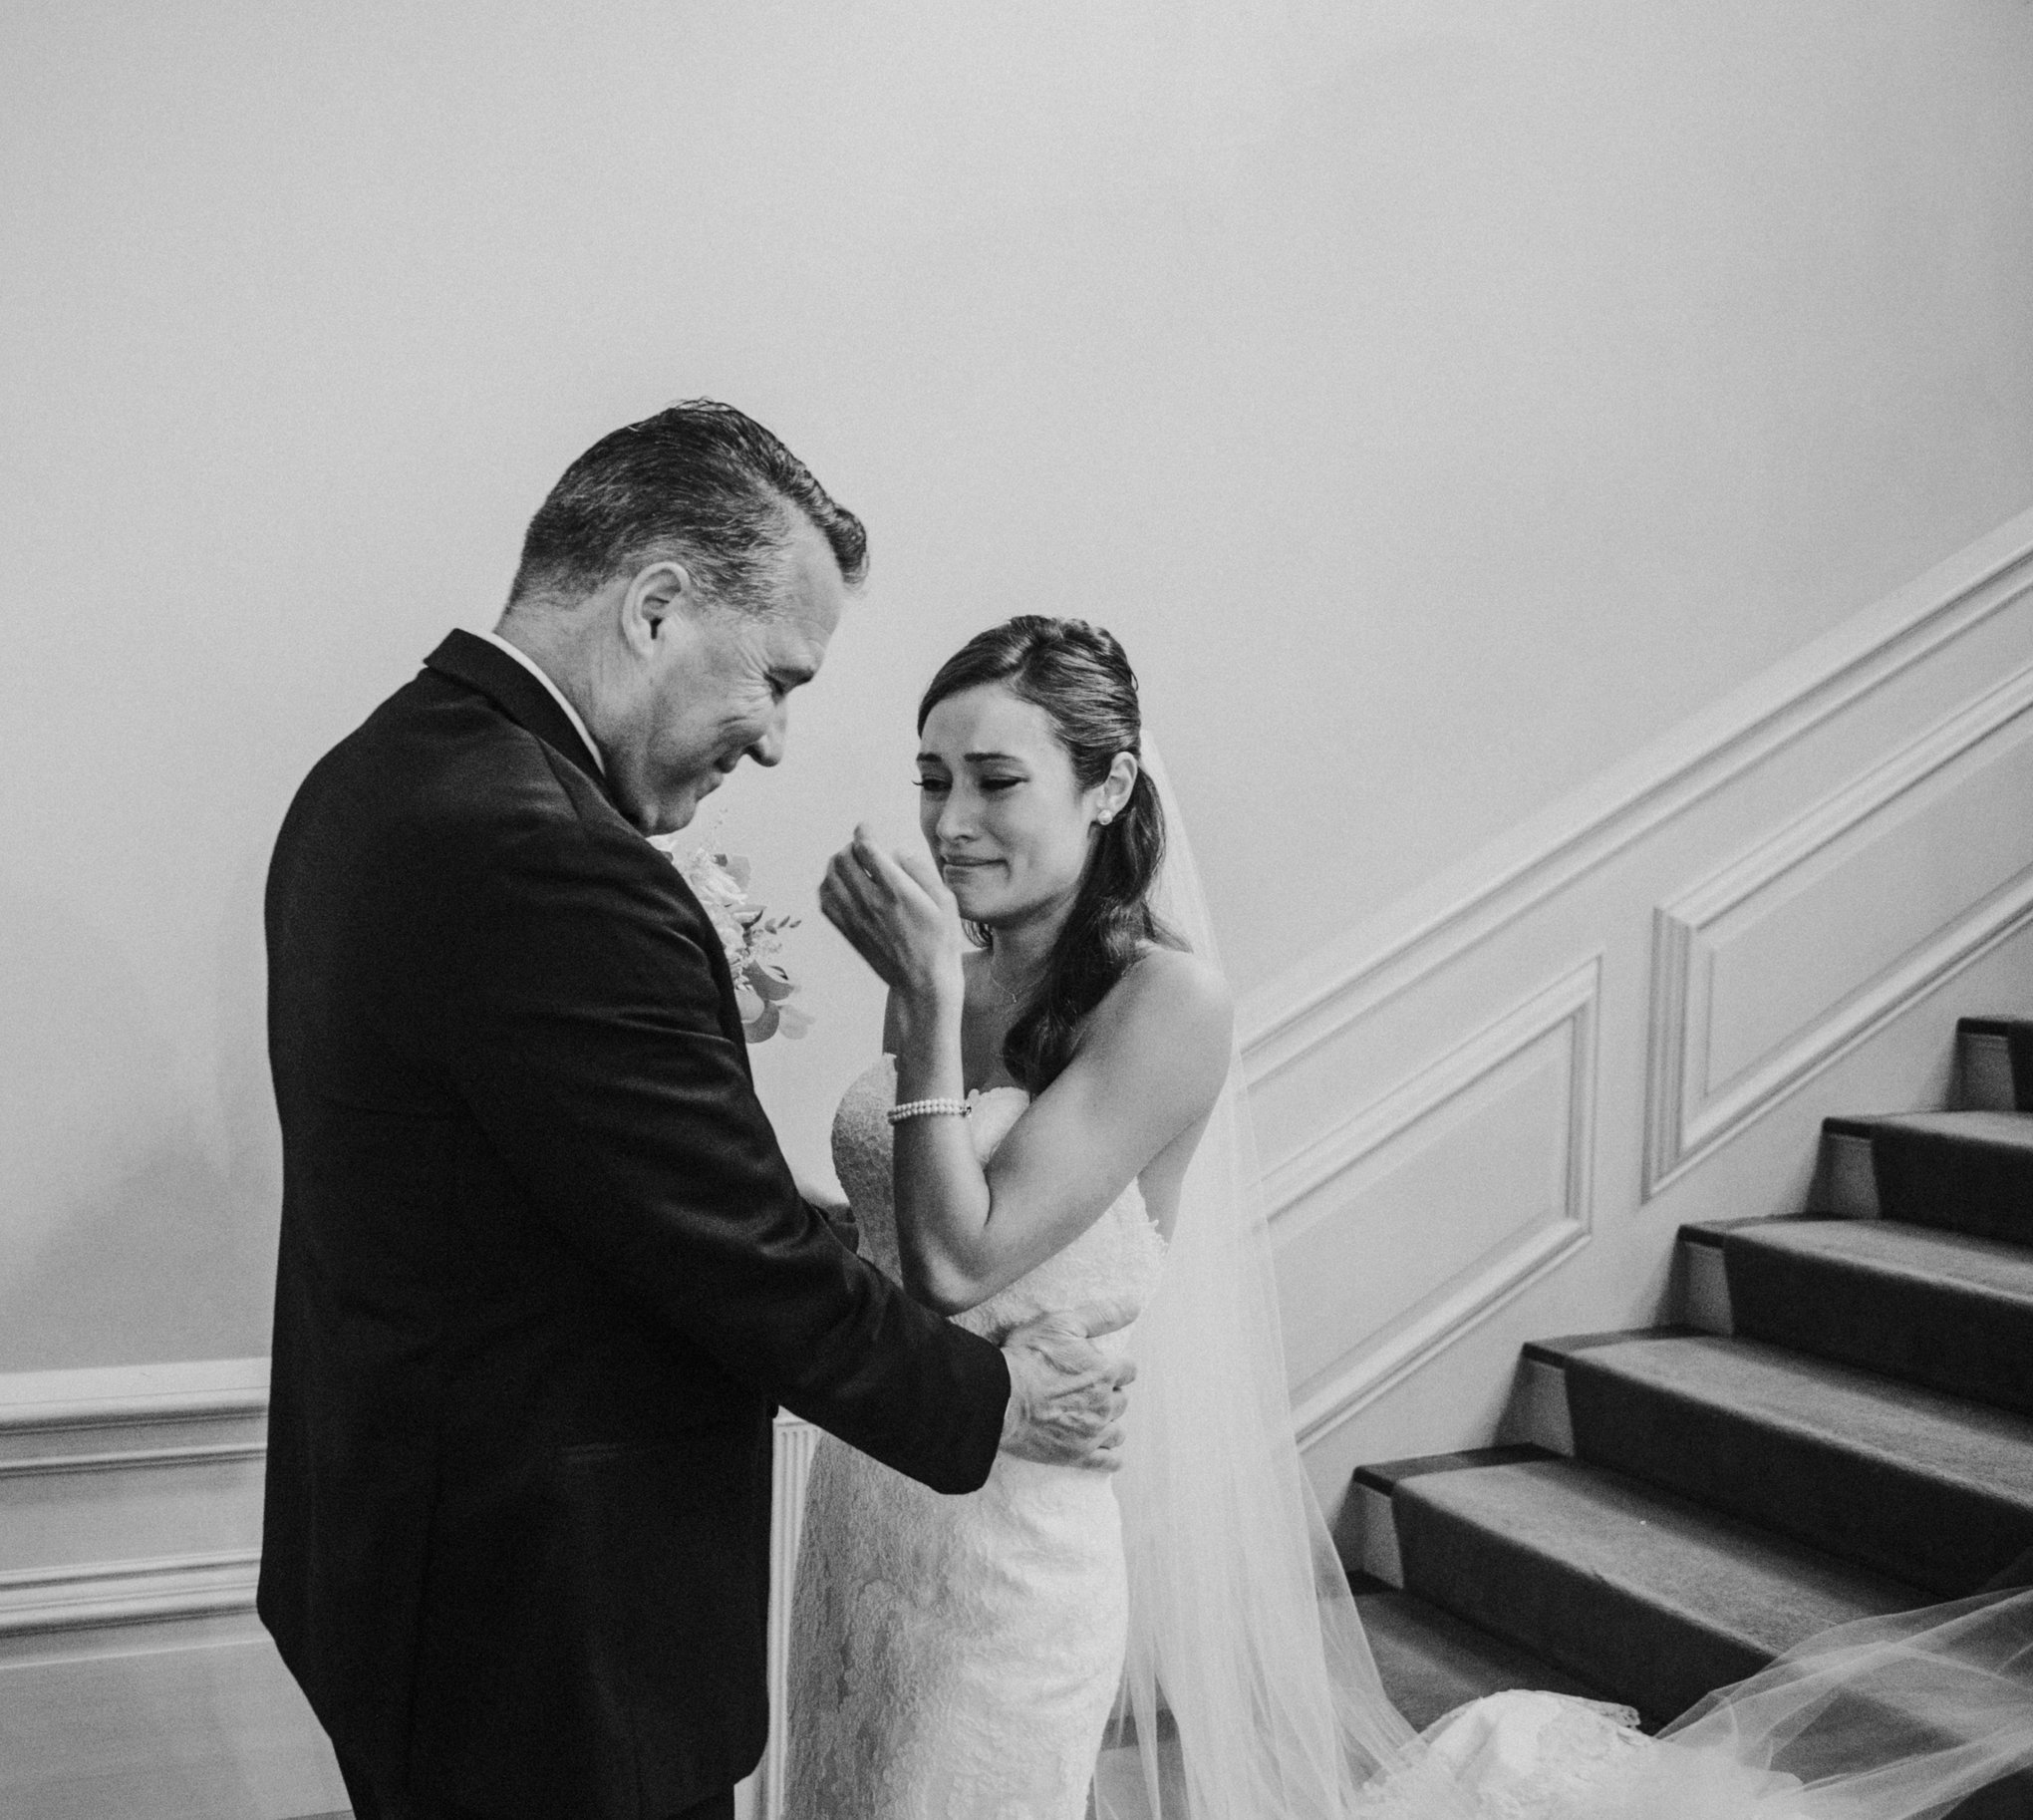 Lena_Mirisola_2017_Weddings_-004.jpg